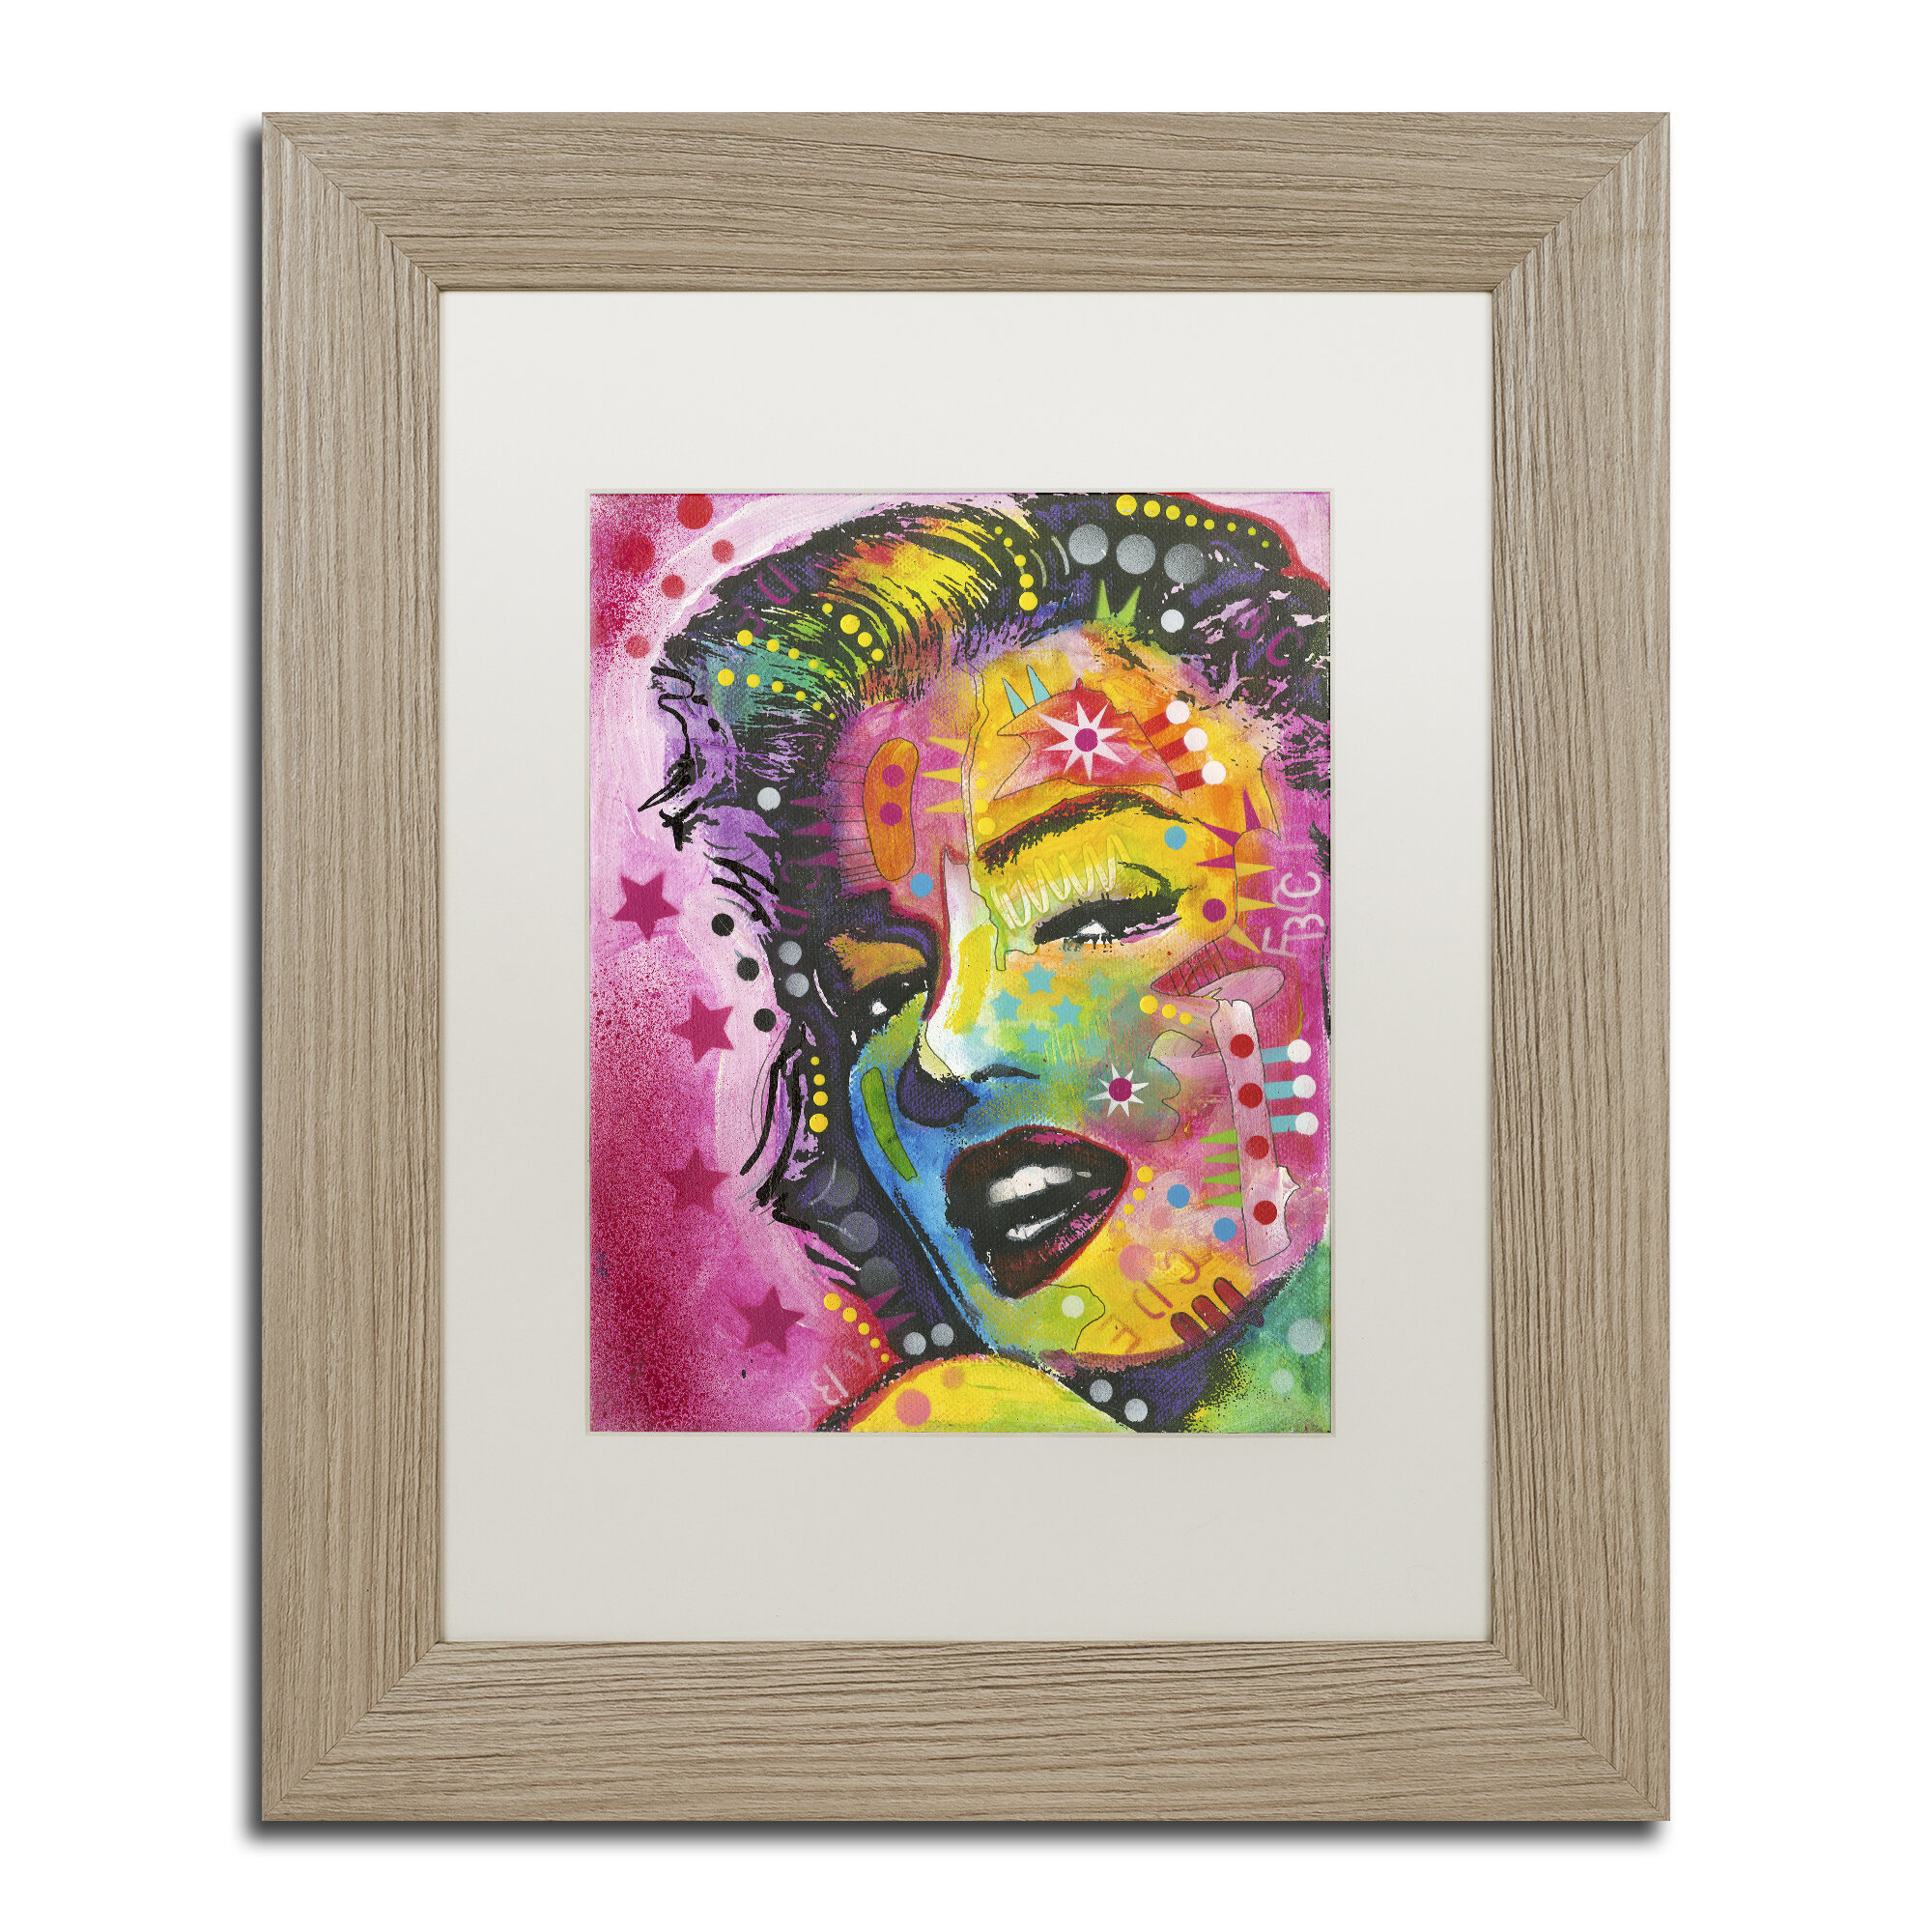 Trademark Art 17 Framed Painting Print On Canvas Wayfair